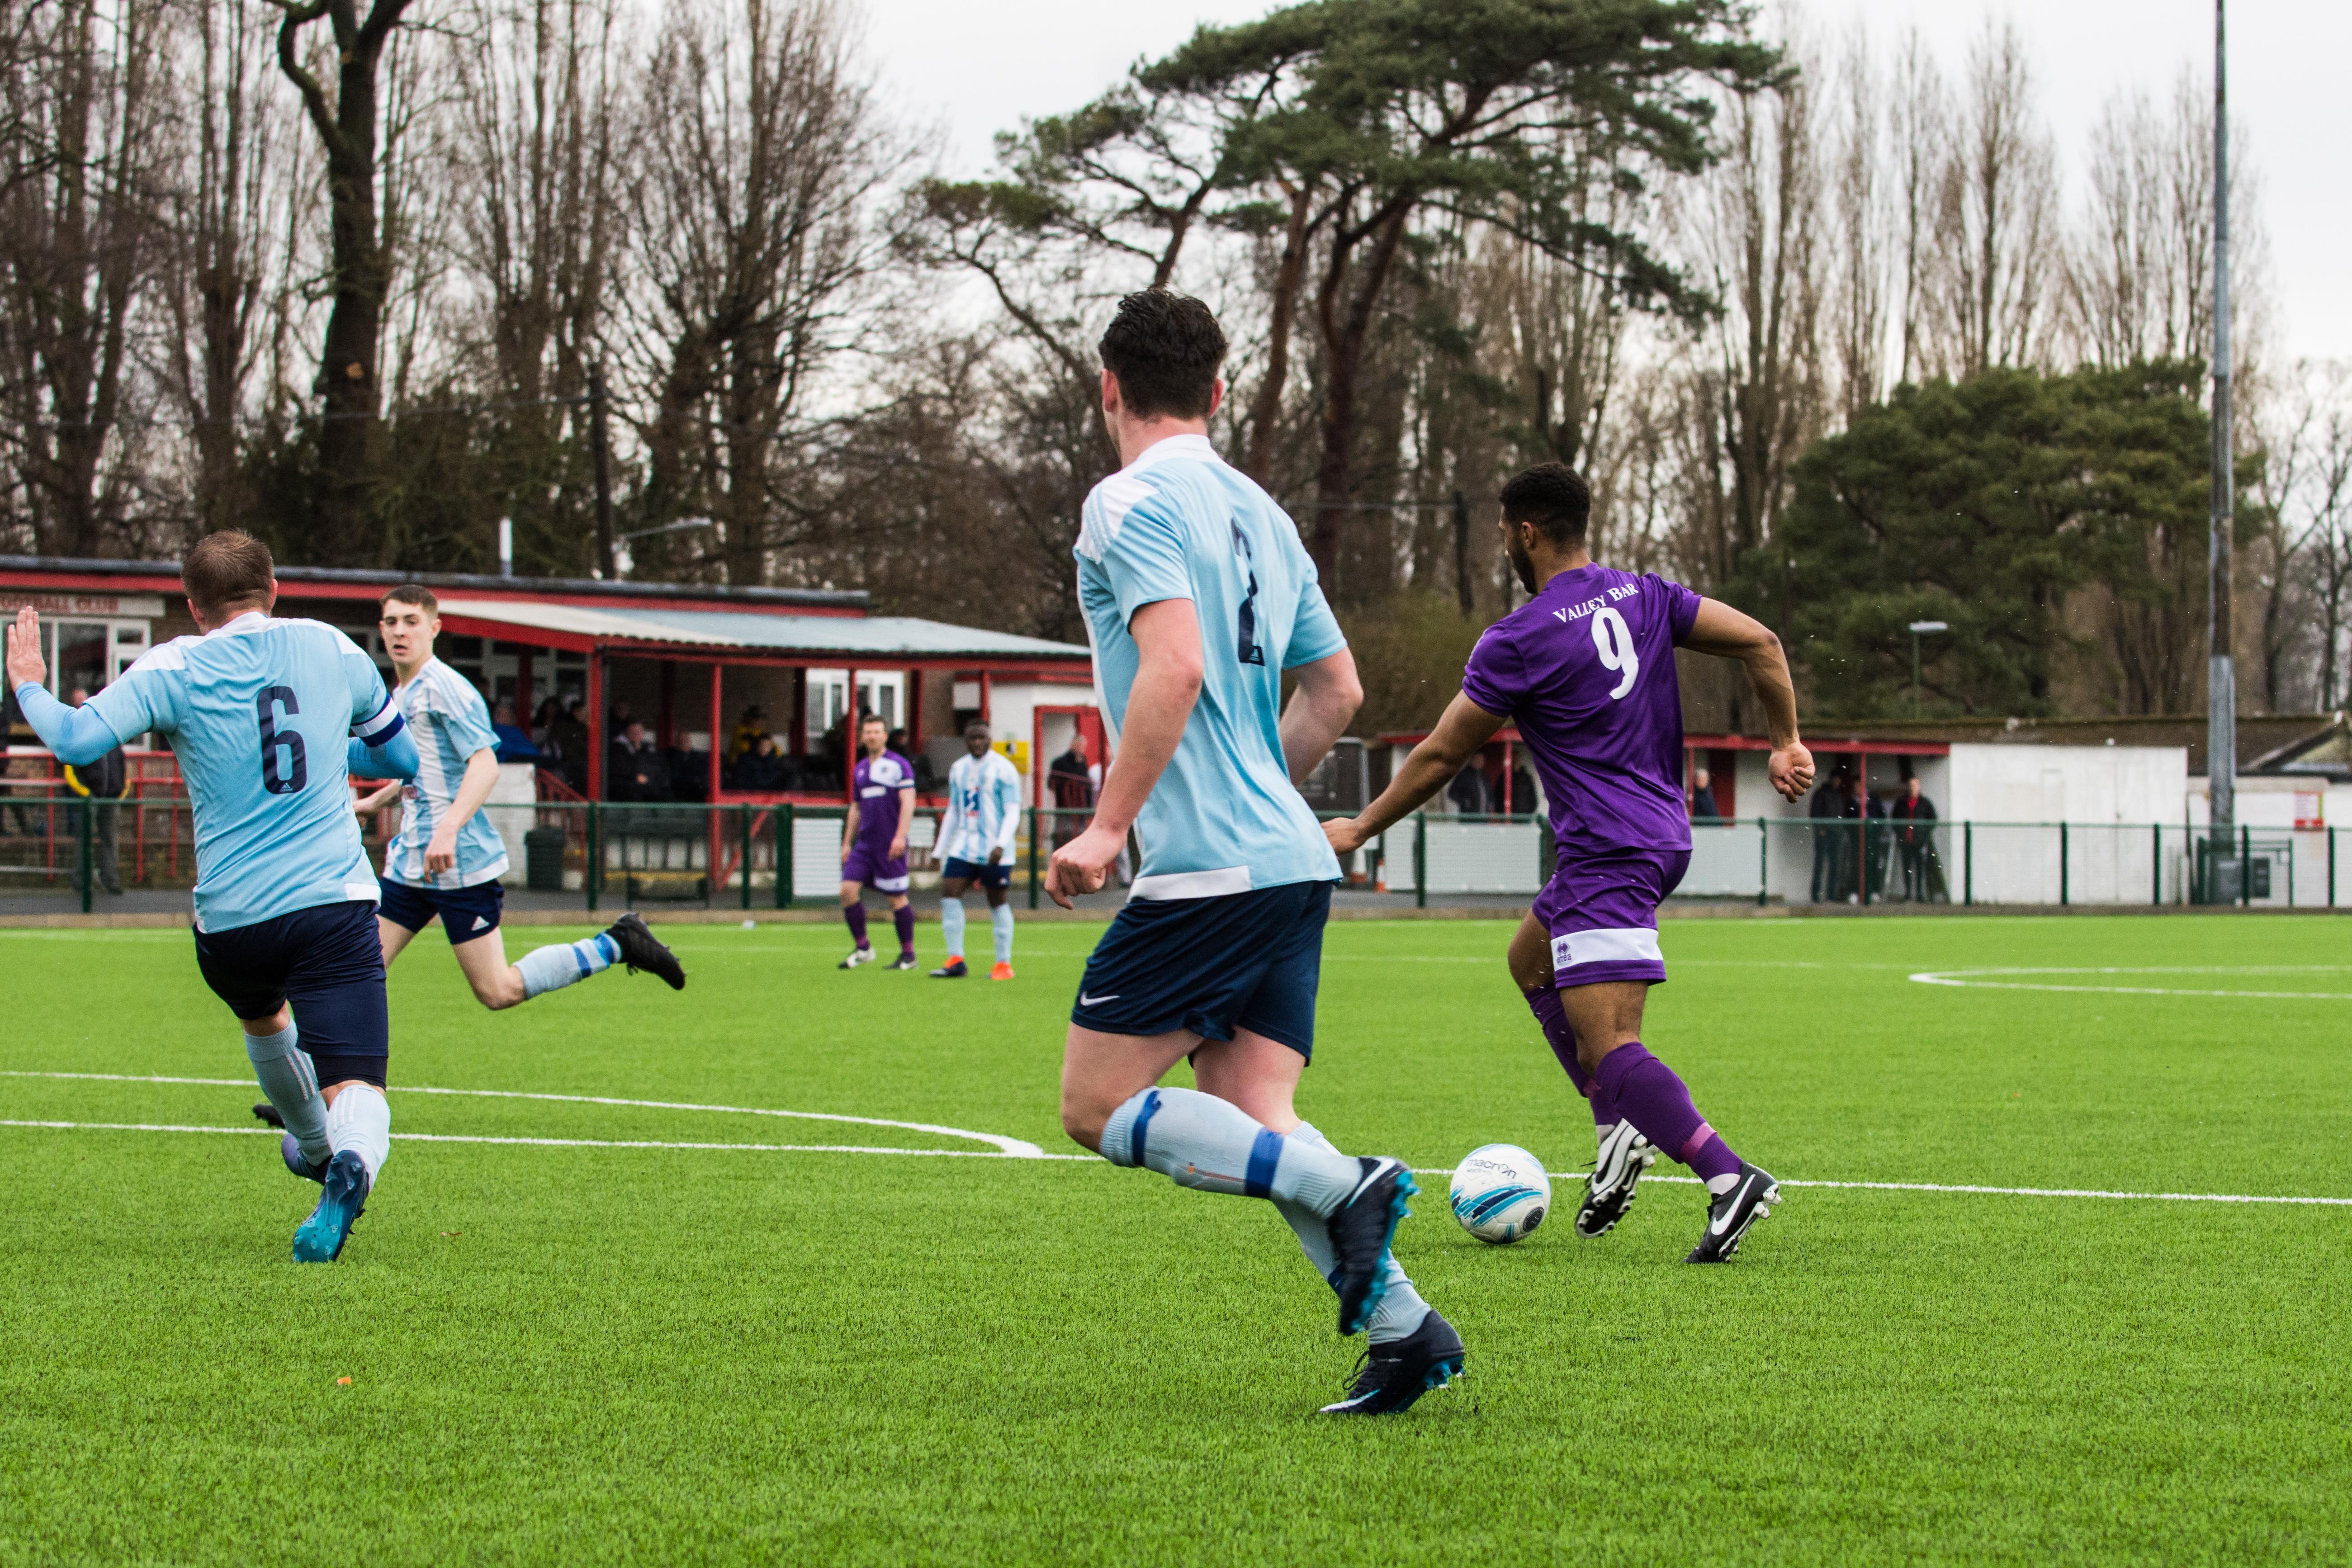 DAVID_JEFFERY Worthing United FC vs East Preston FC 02.04.18 56